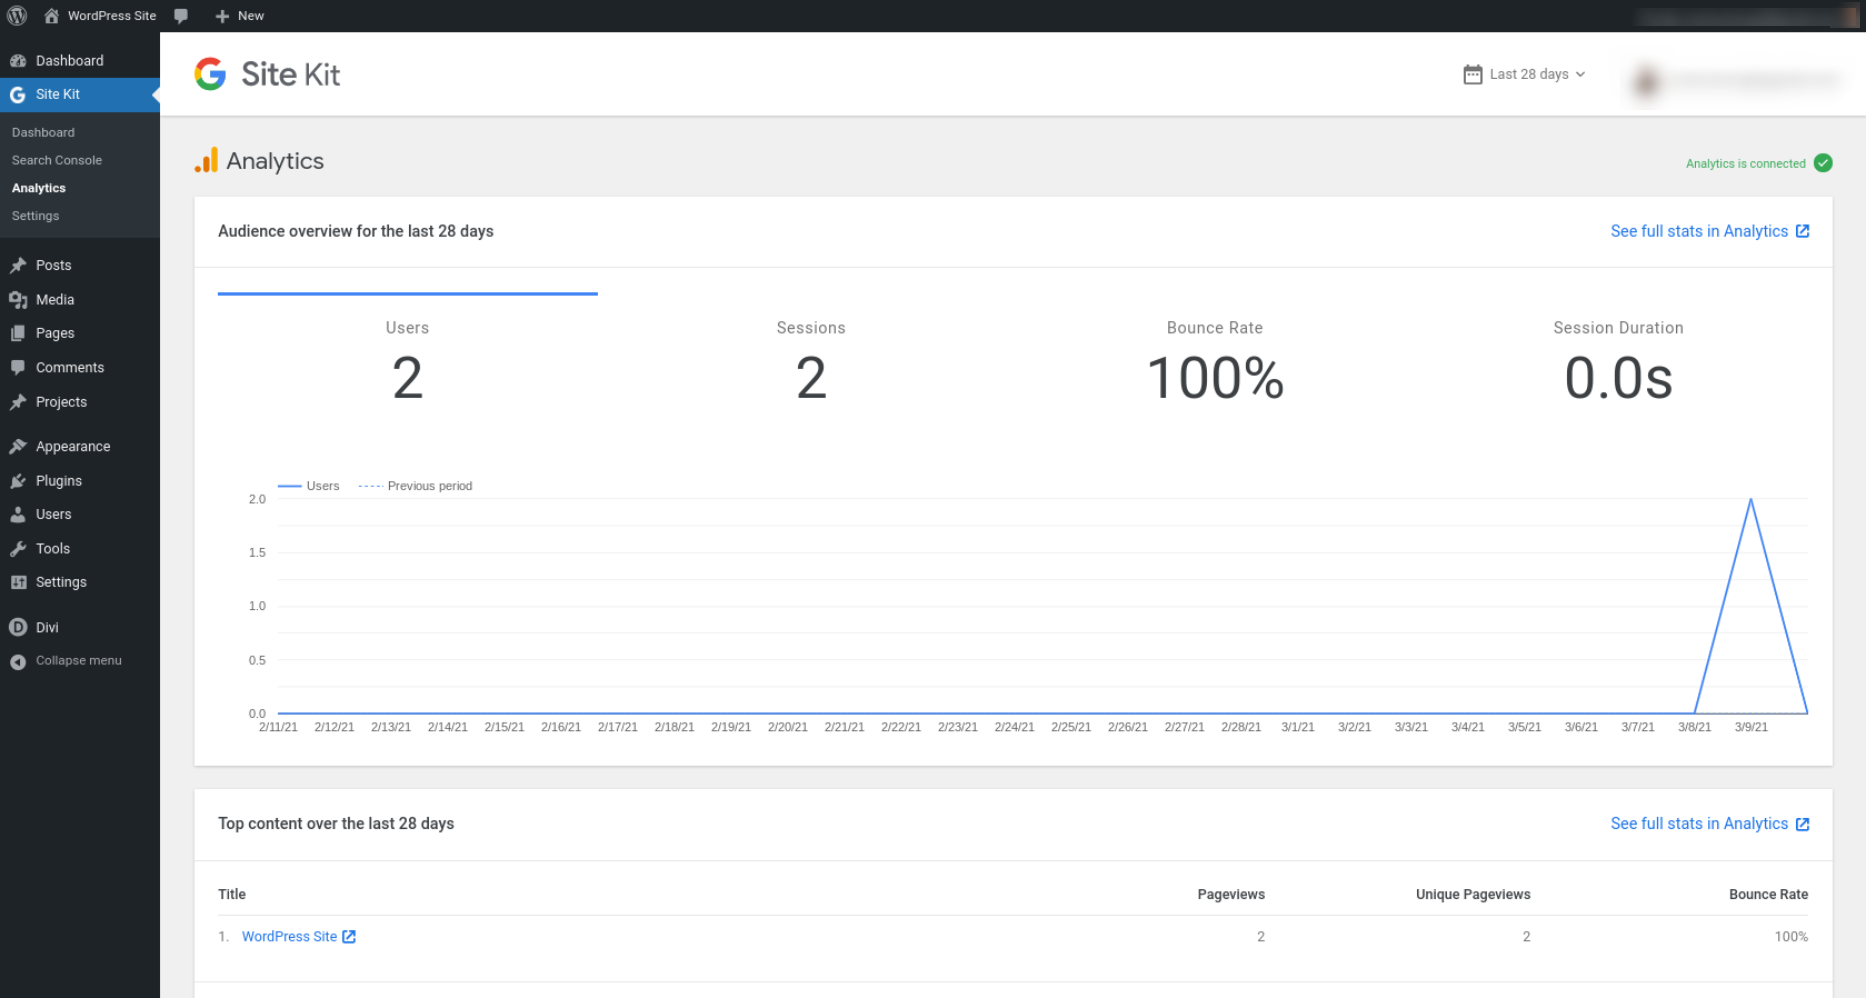 The Google Site Kit plugin's Analytics dashboard.